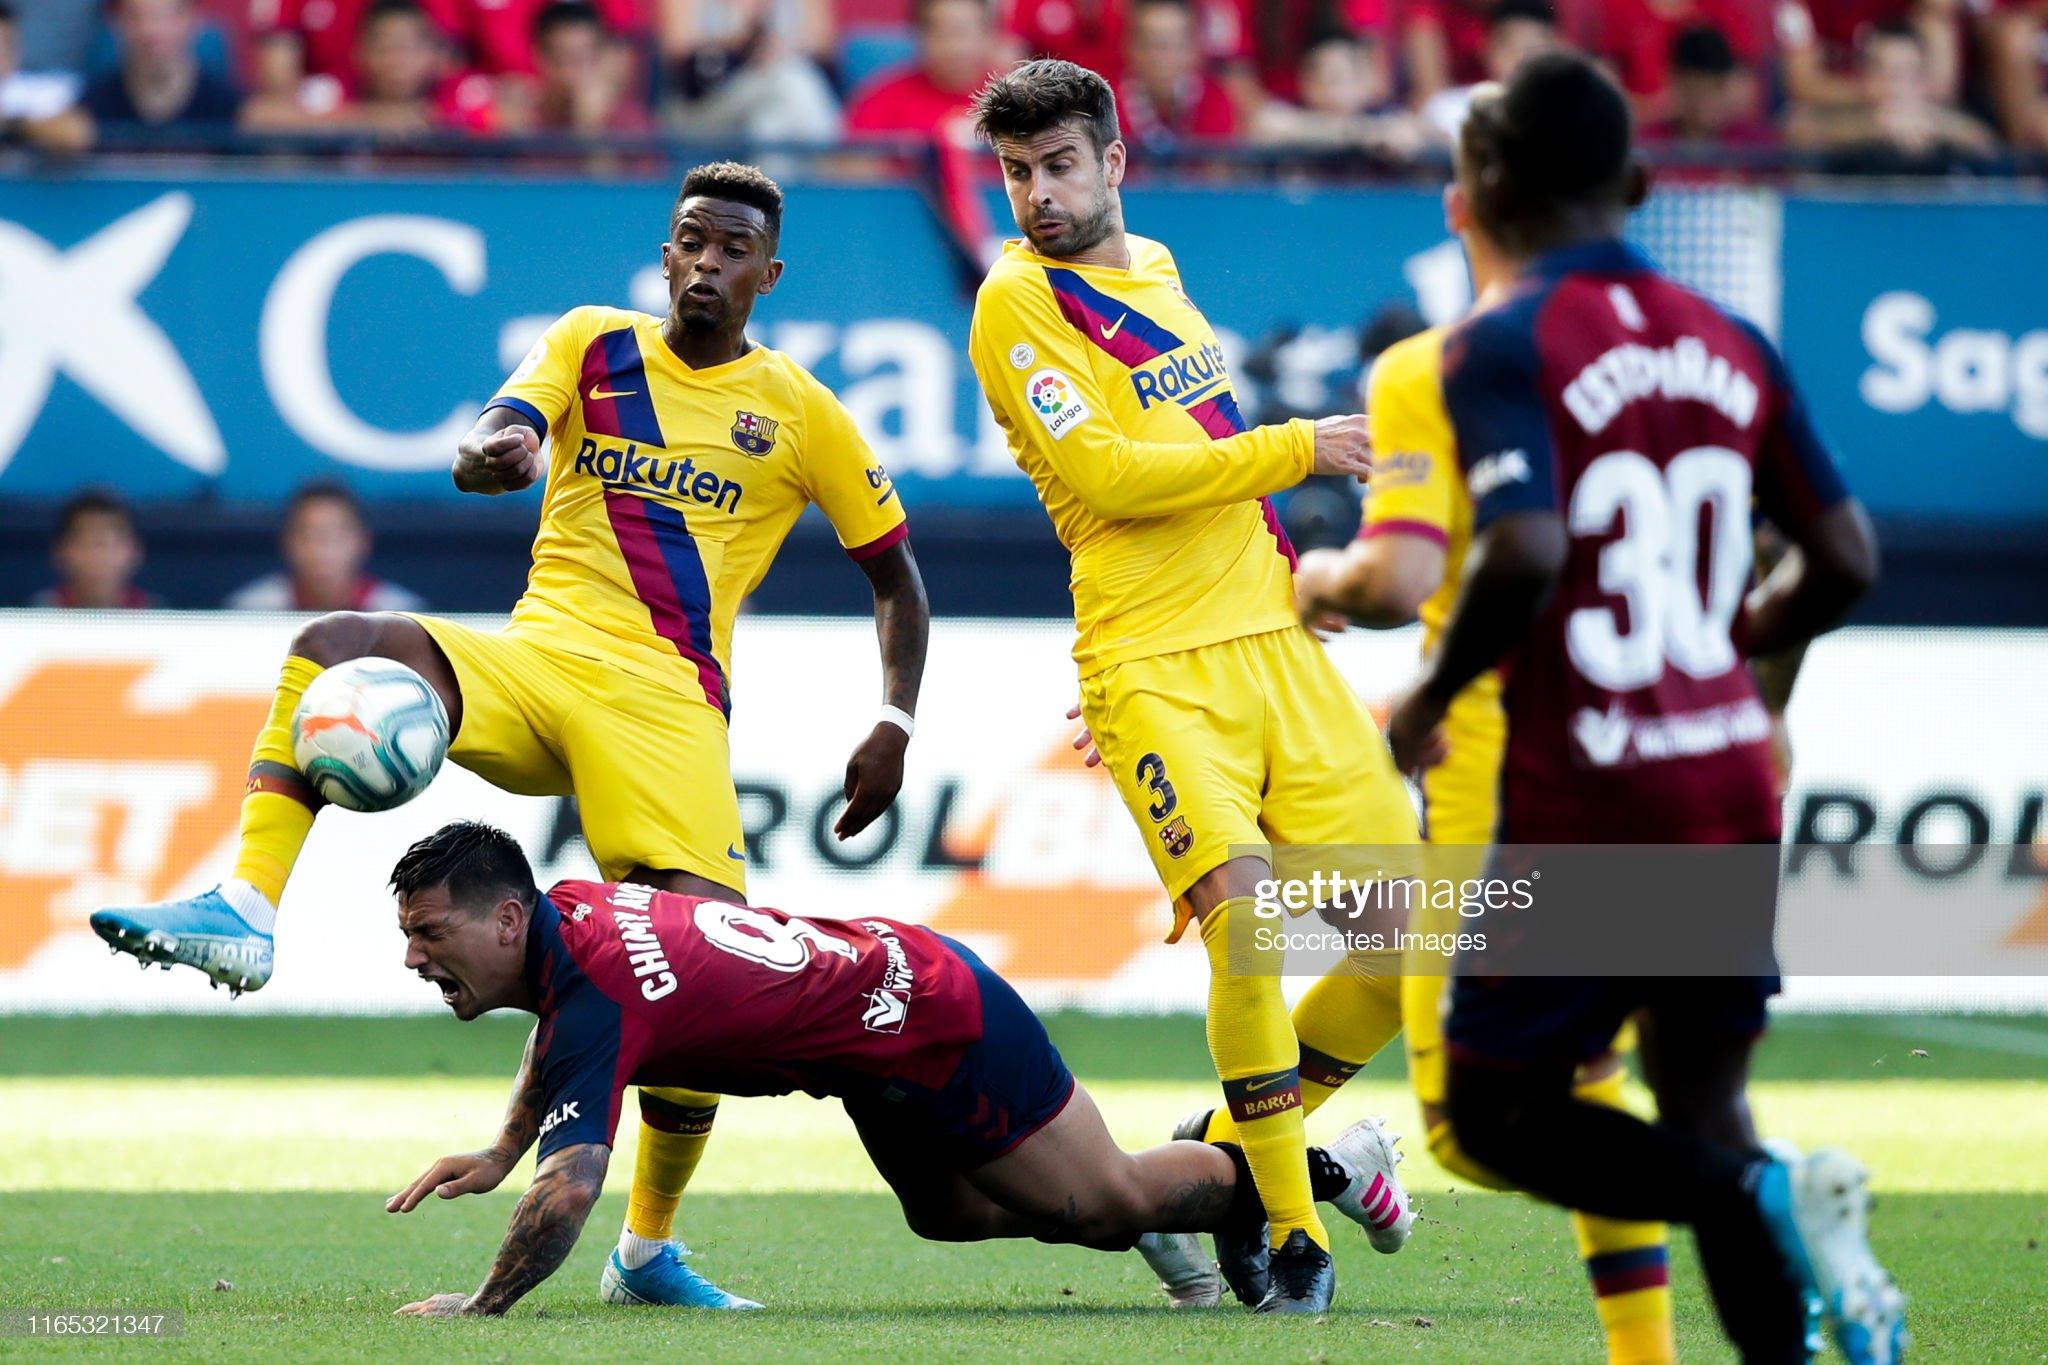 صور مباراة : أوساسونا - برشلونة 2-2 ( 31-08-2019 )  Nelson-semedo-of-fc-barcelona-chimy-avila-of-ca-osasuna-gerard-pique-picture-id1165321347?s=2048x2048